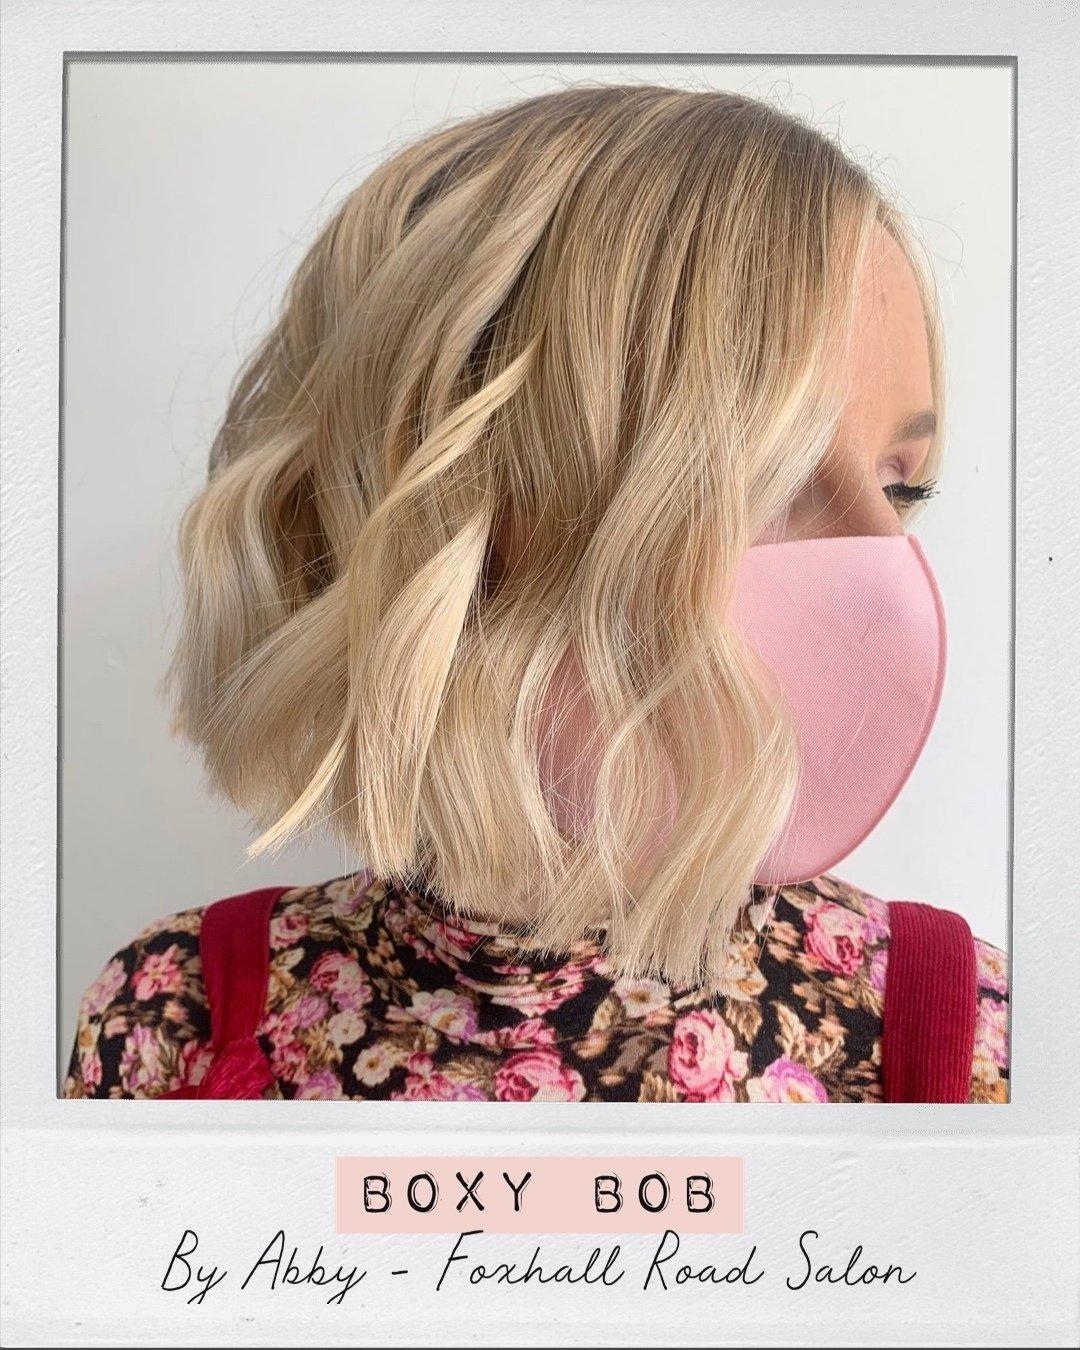 Boxy Bob Haircut Hair Ministry Ipswich